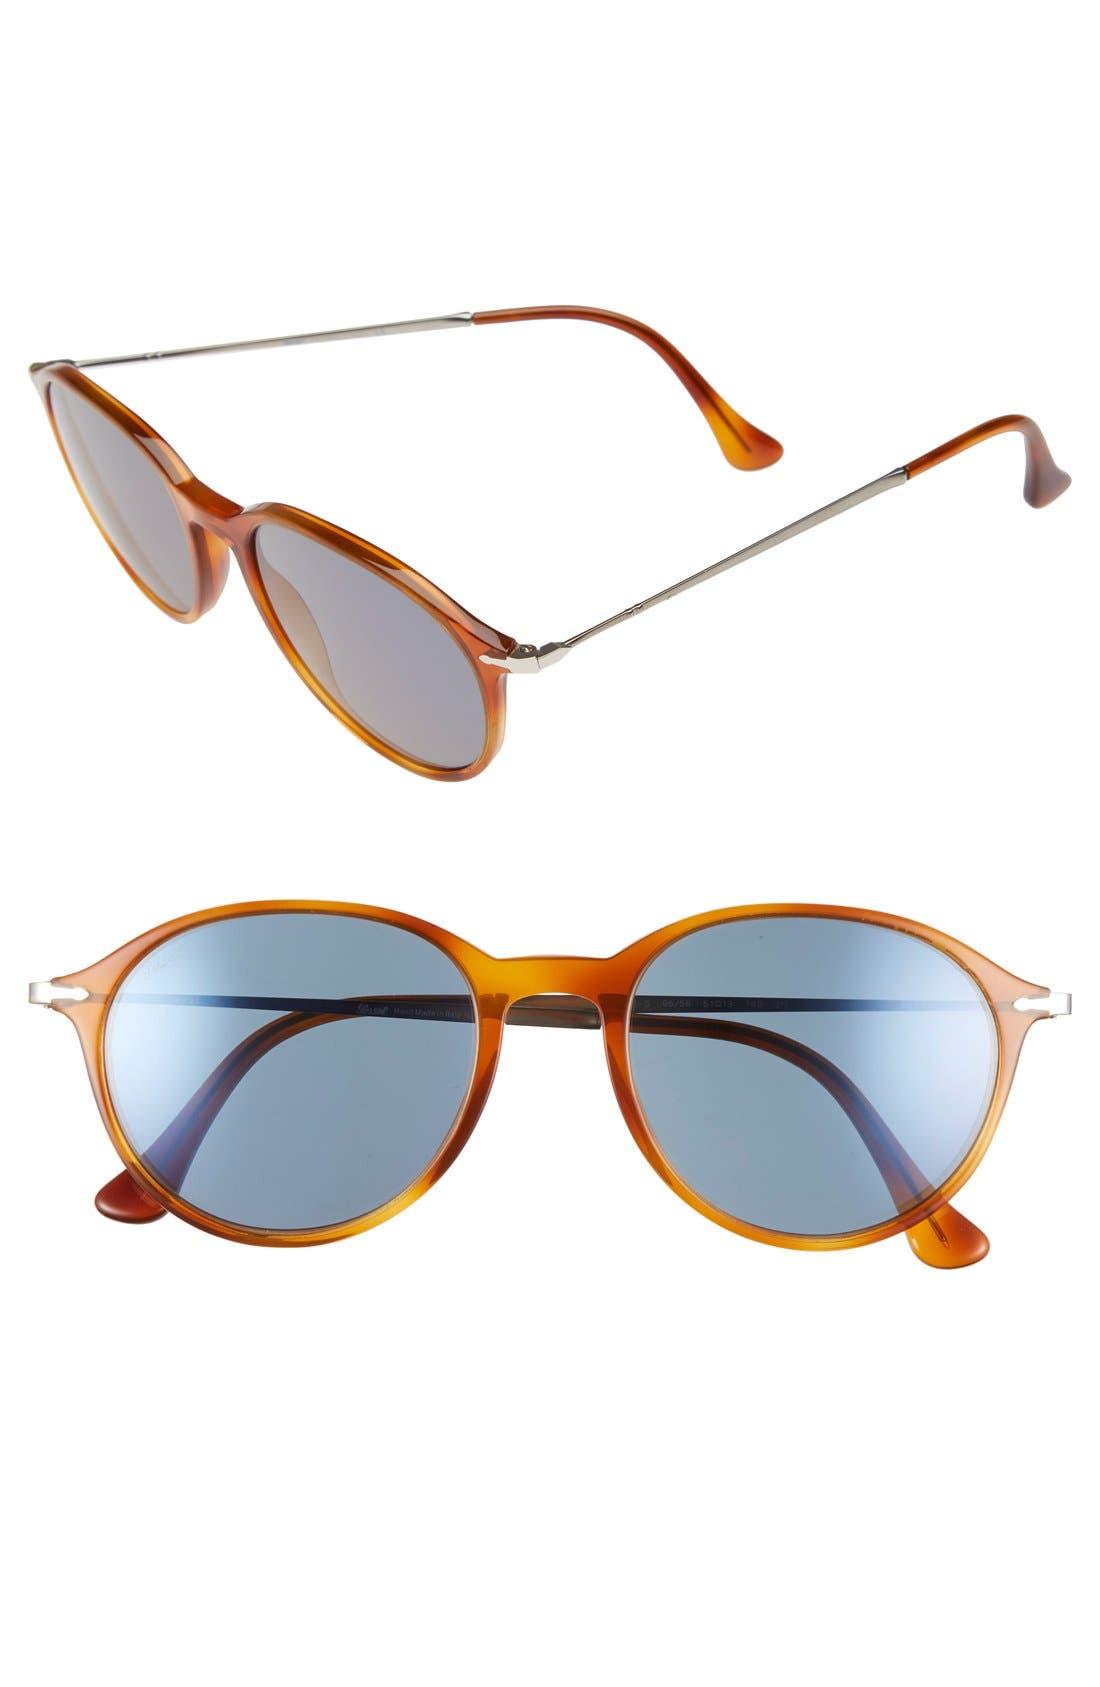 51mm Sunglasses,                         Main,                         color, 235